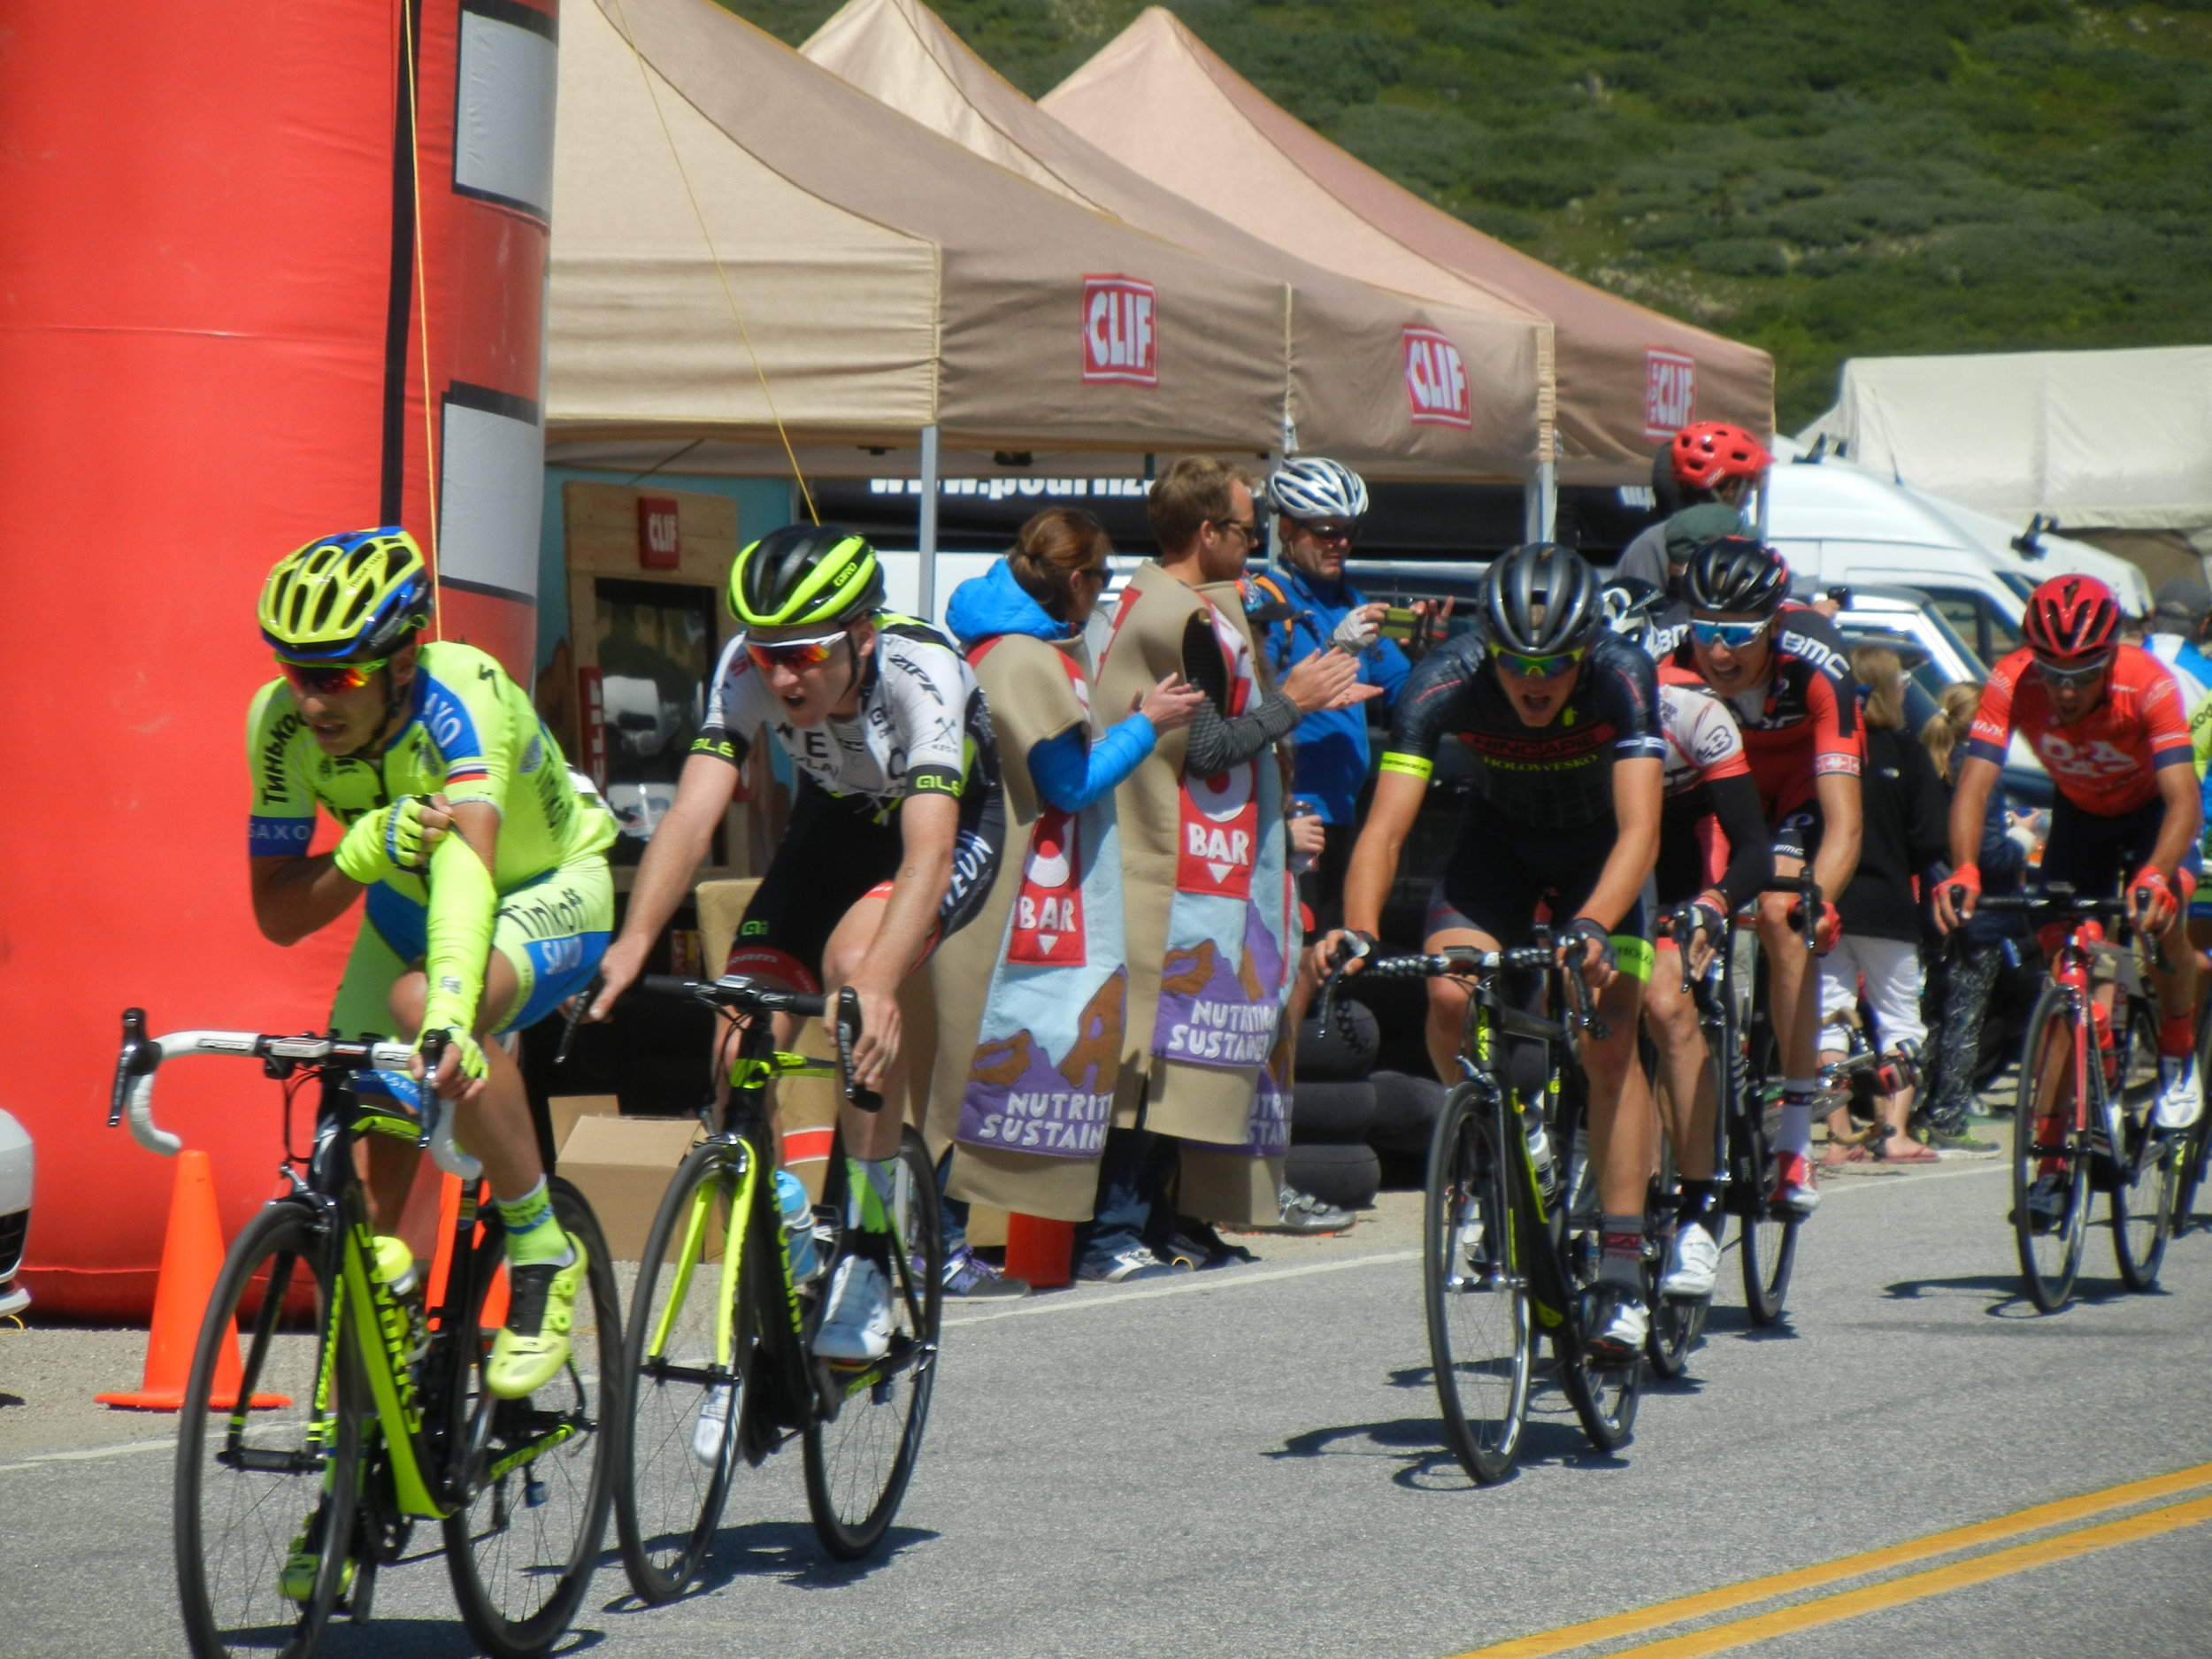 The 2015 Pro Cycling Tour